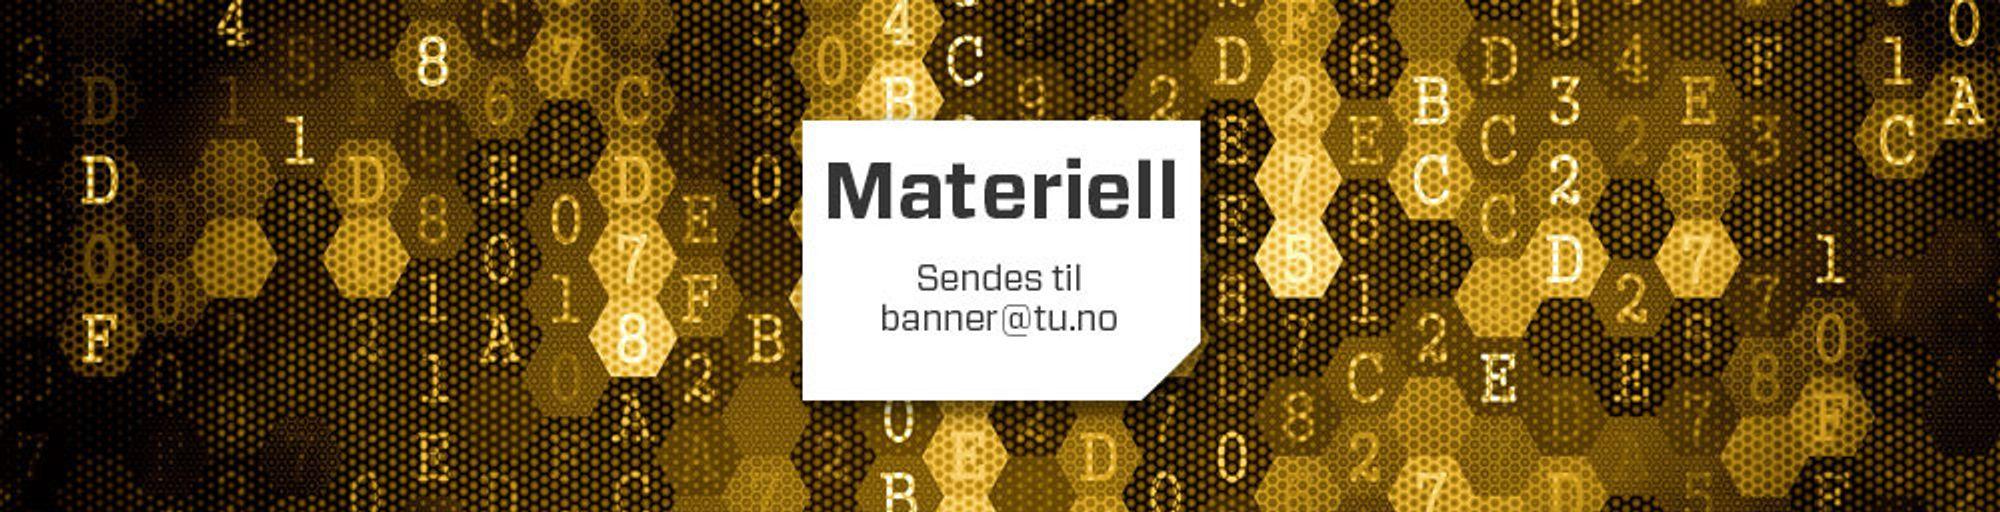 Materiell TU